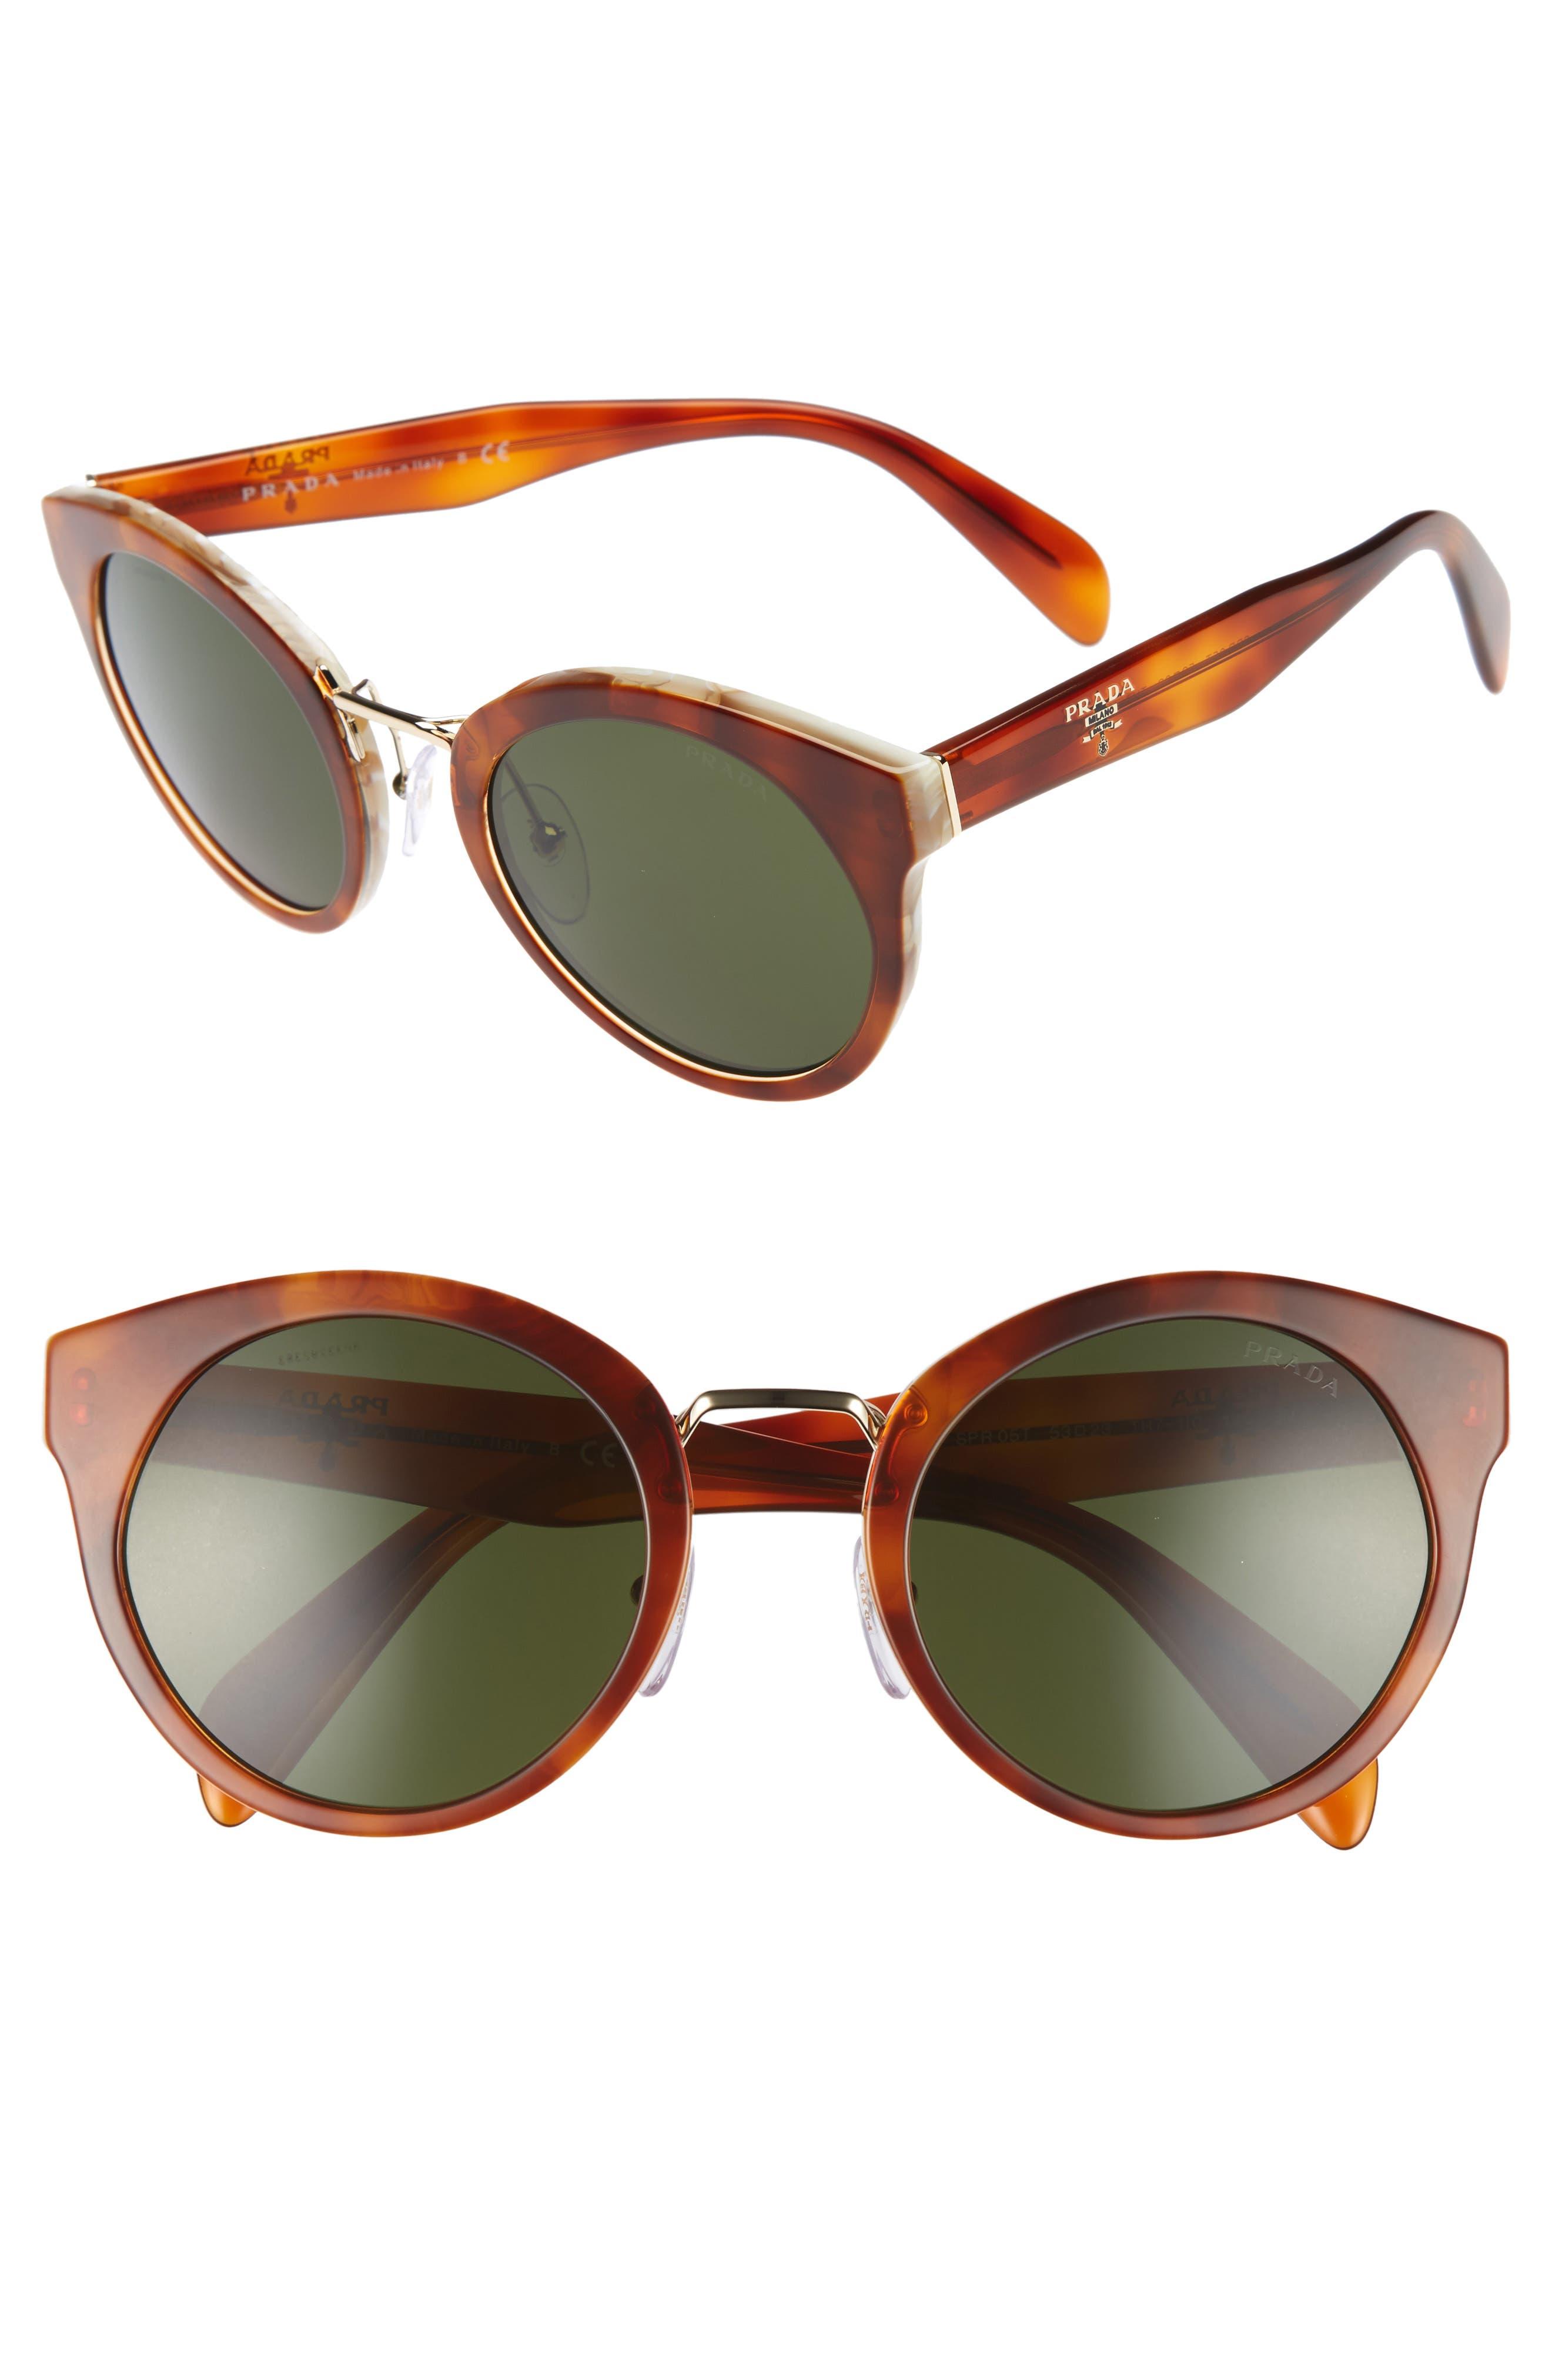 53mm Cat Eye Sunglasses,                         Main,                         color, Lite Havana